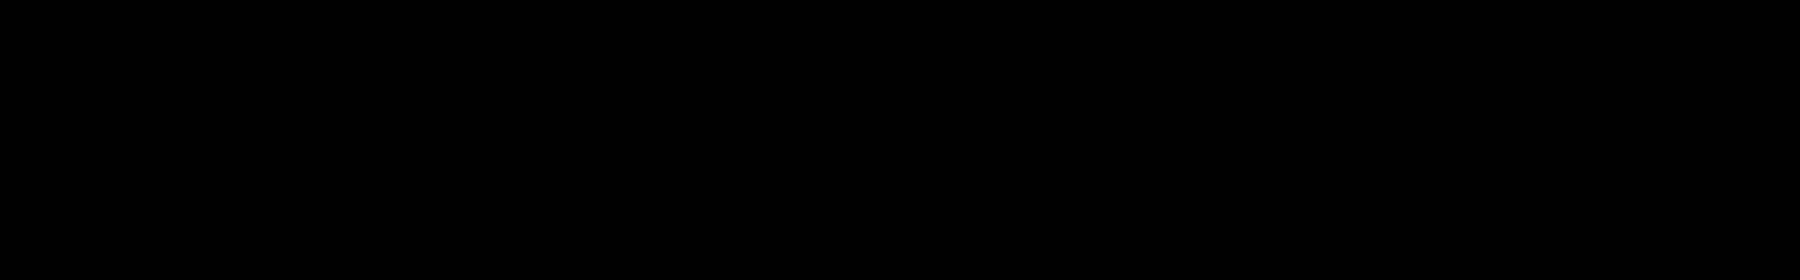 Avalanche audio waveform